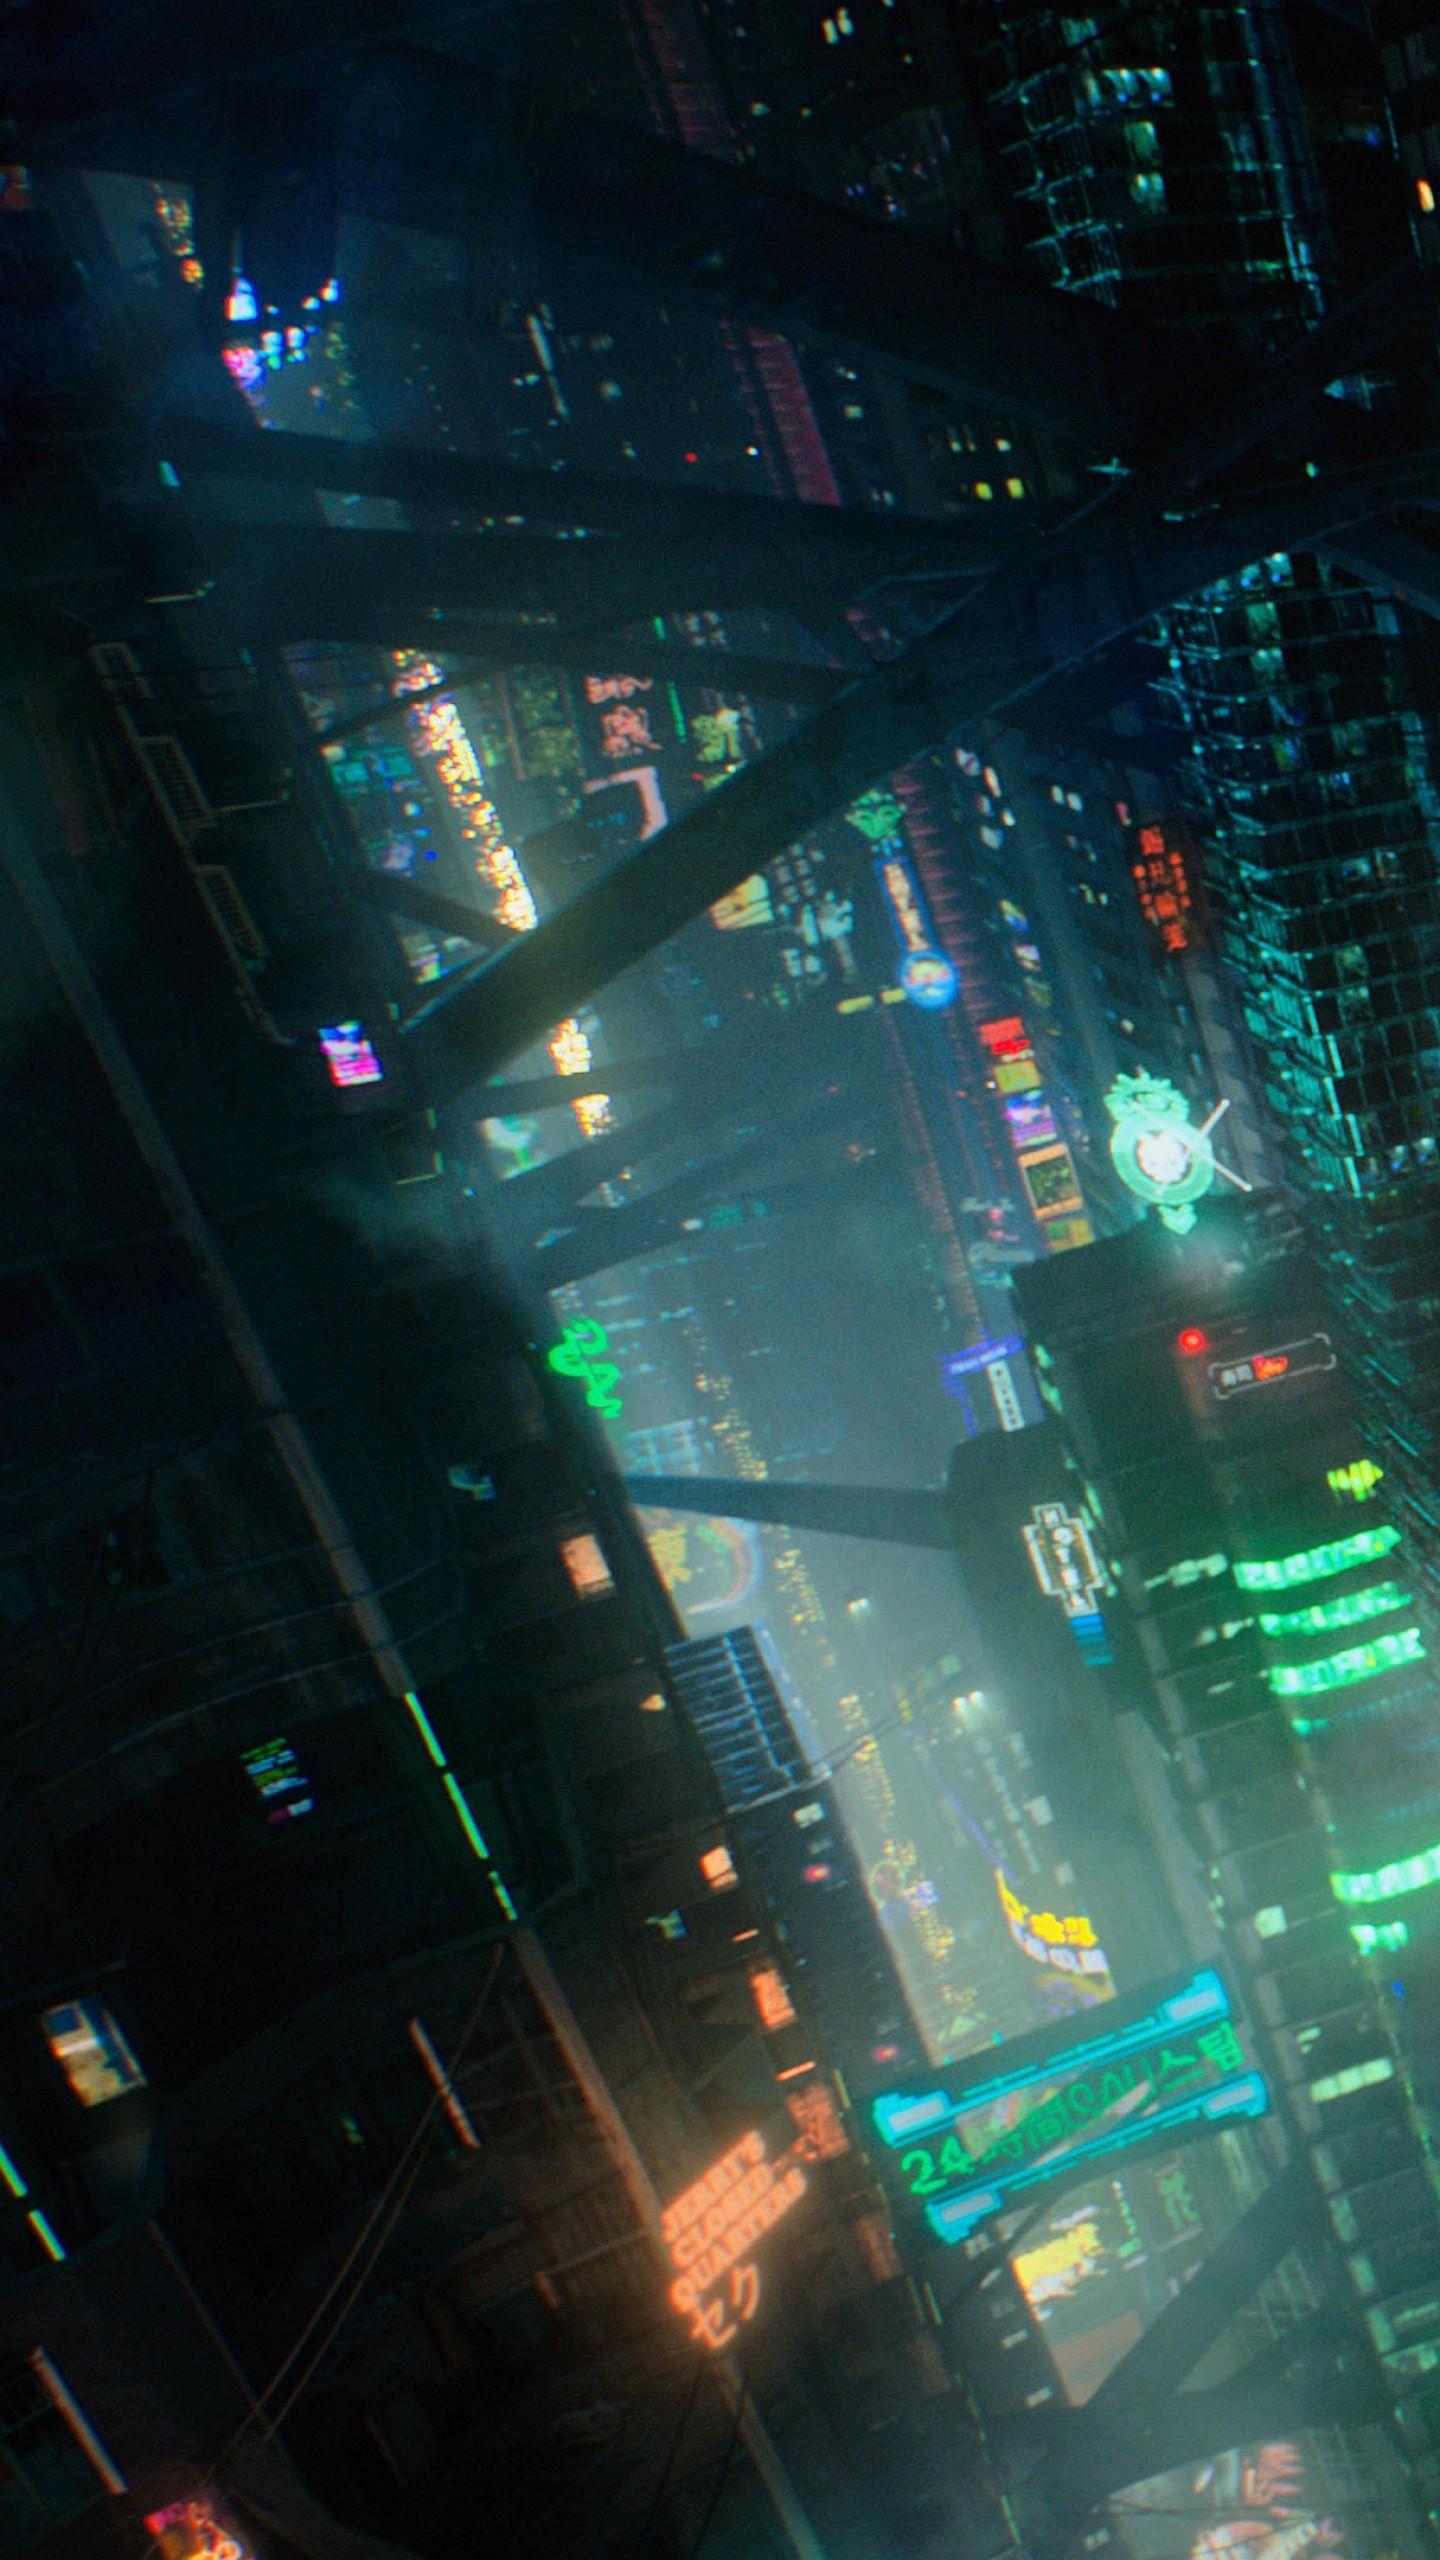 Wallpaper futuristic cyberpunk future world 4K Art 20446